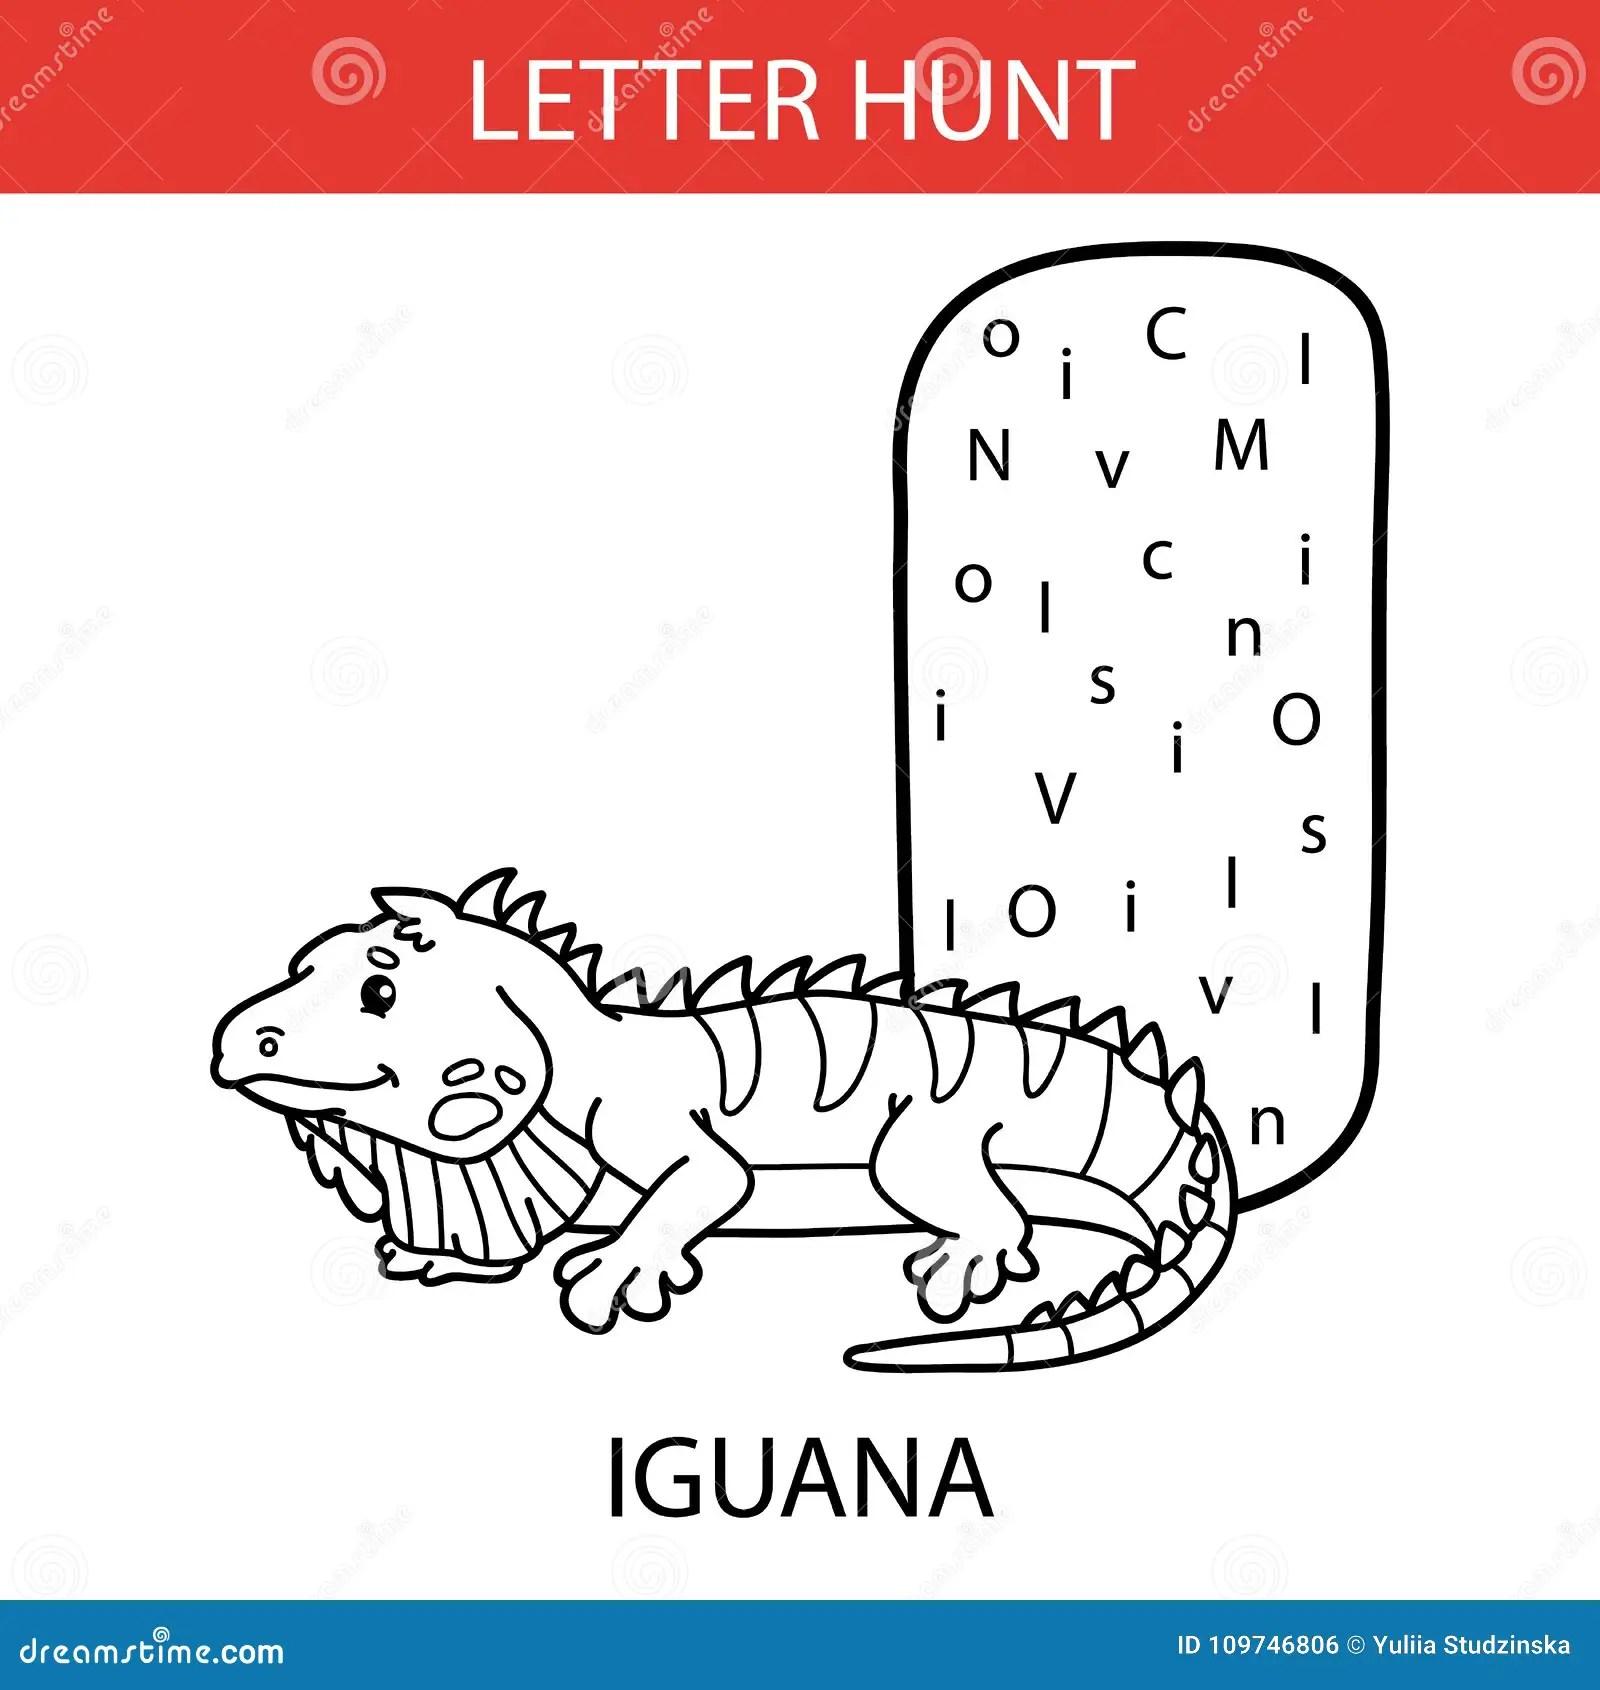 Animal Letter Hunt Iguana Stock Vector Illustration Of